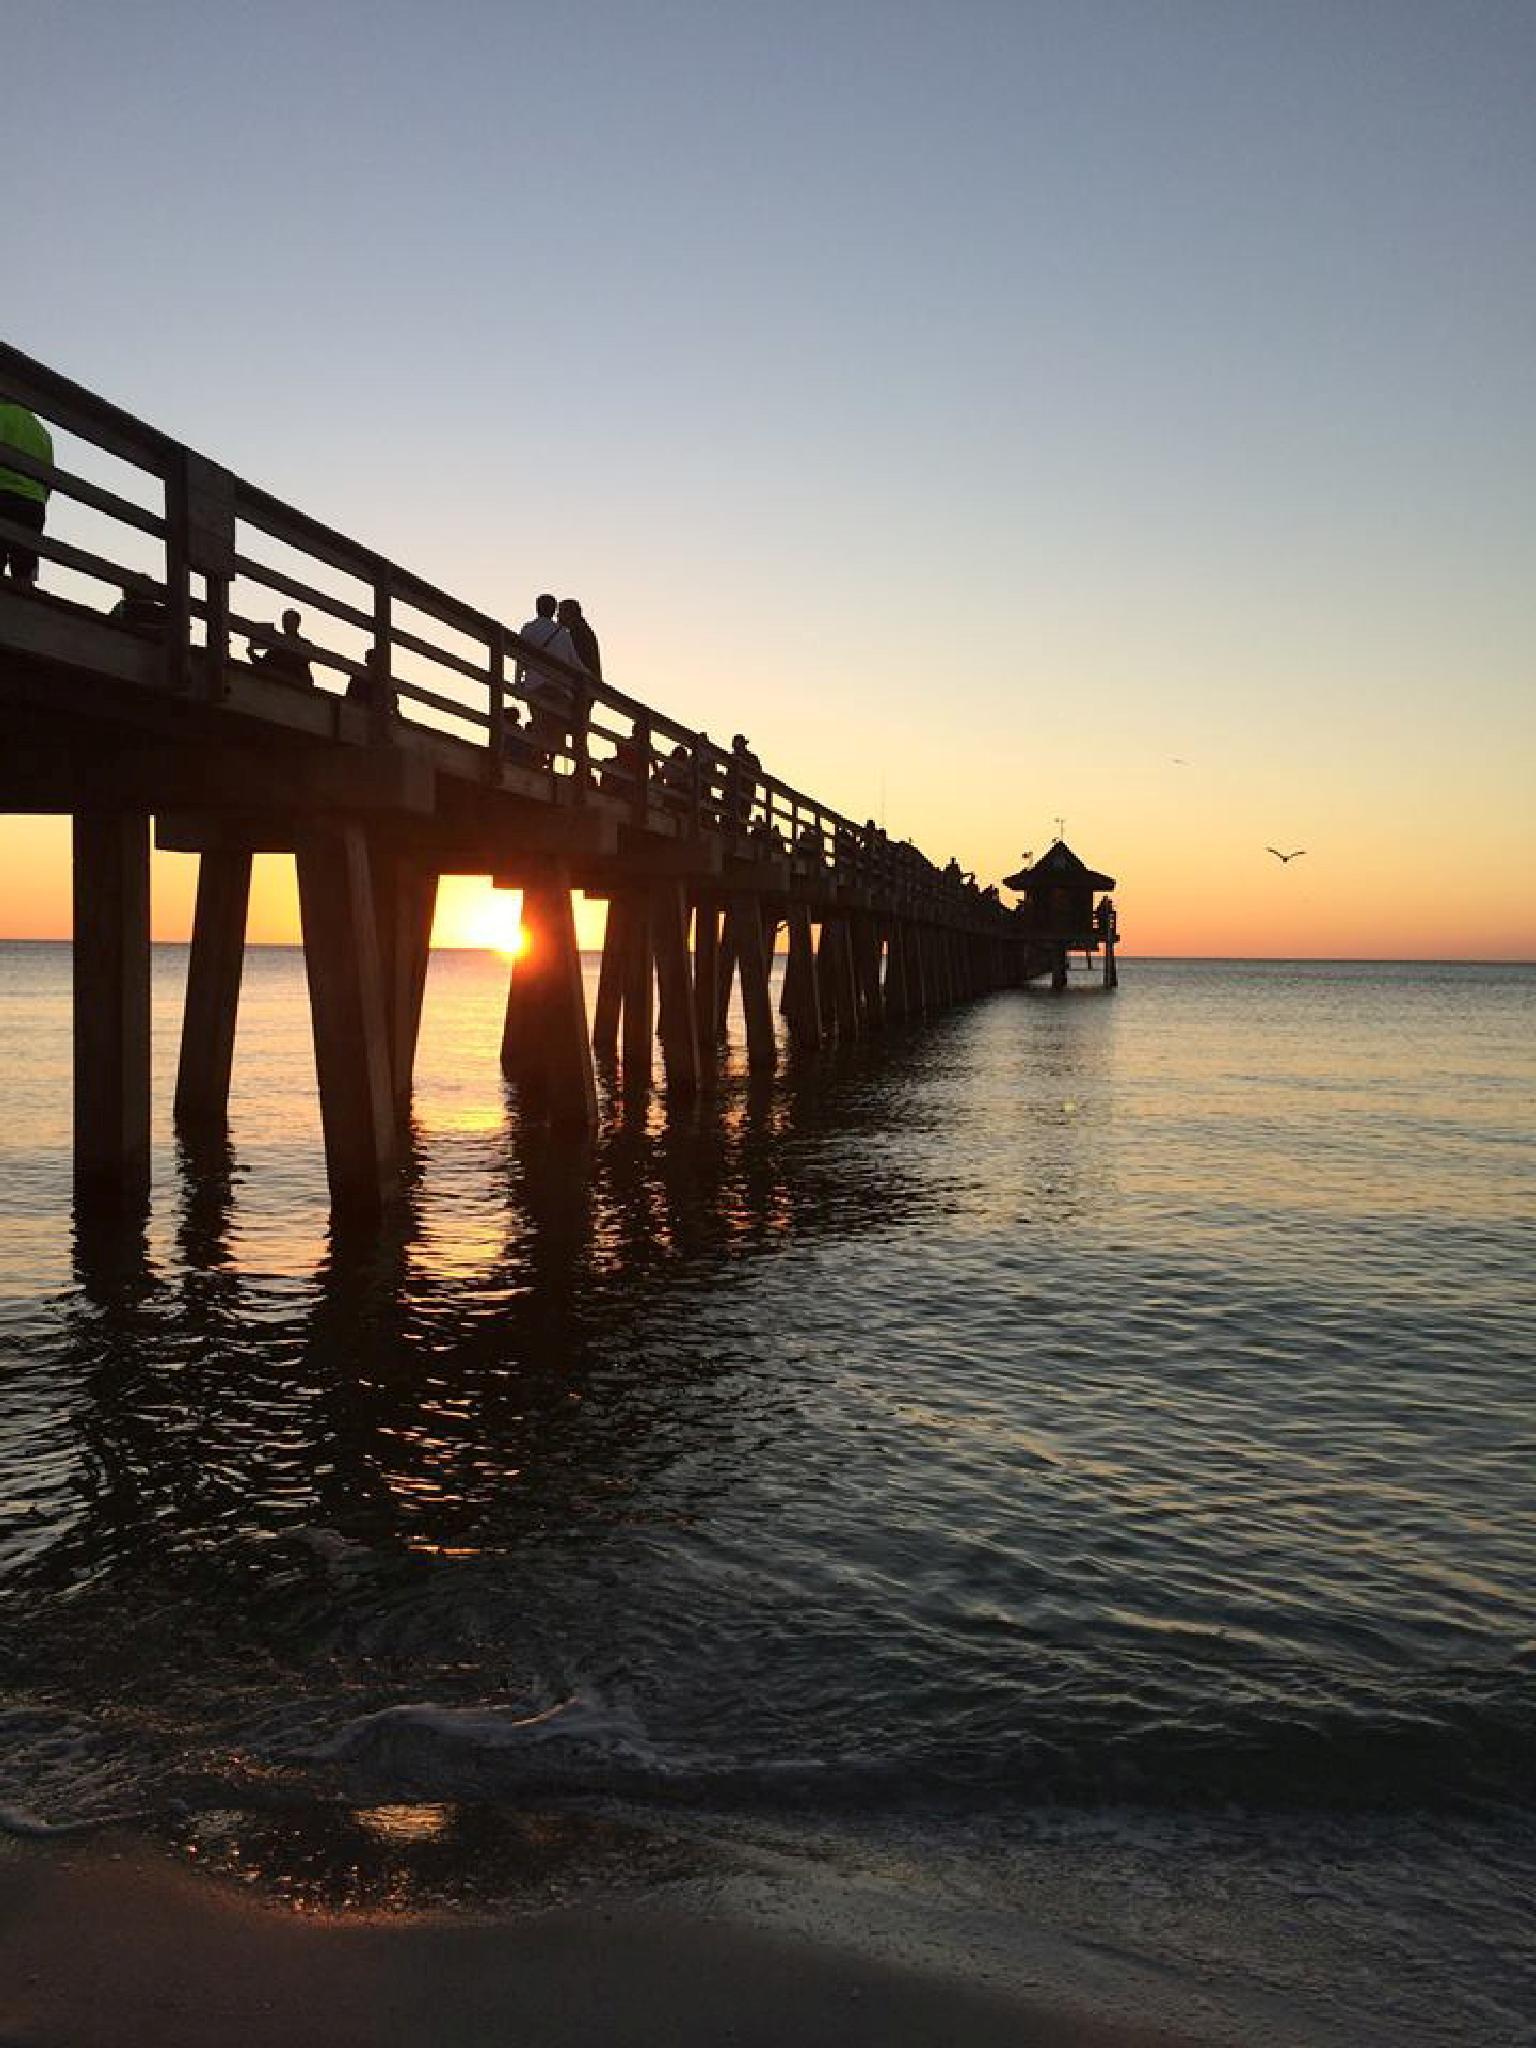 Naples FL. Pier at sunset by annieboland1954